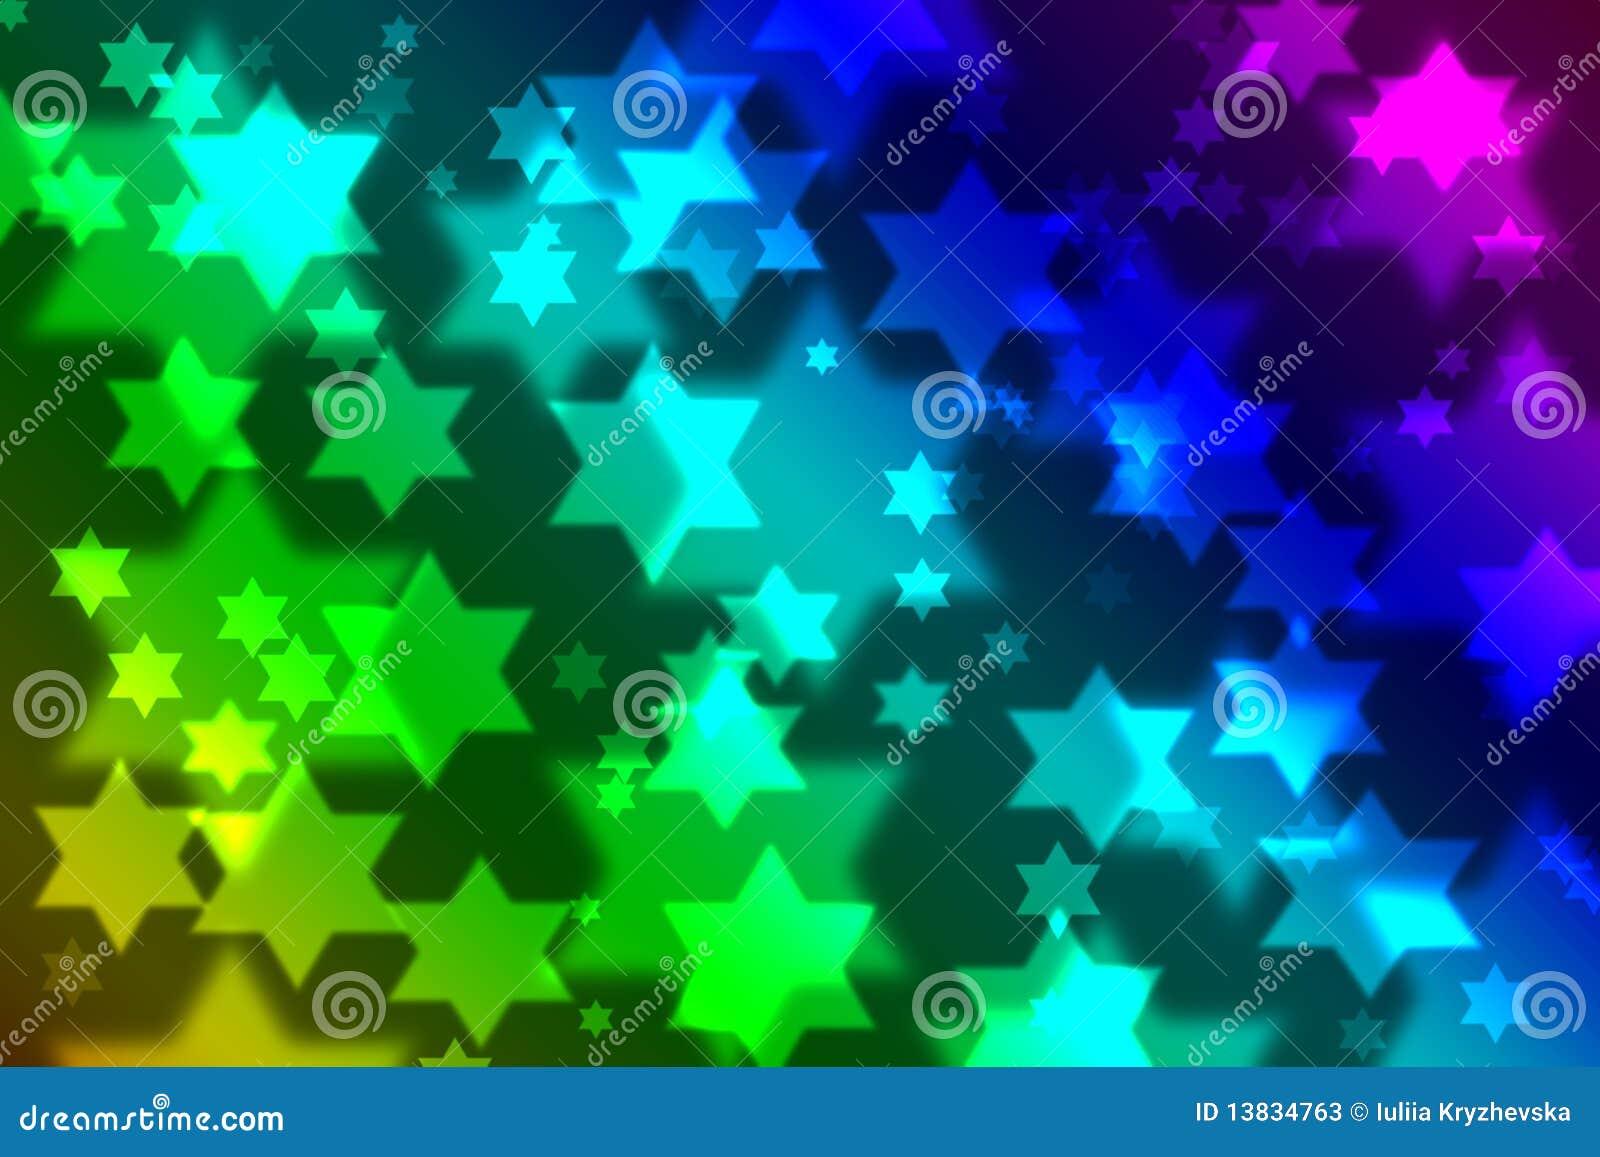 Jewish Star Celebration Background Bokeh Stock Photos - Image ...